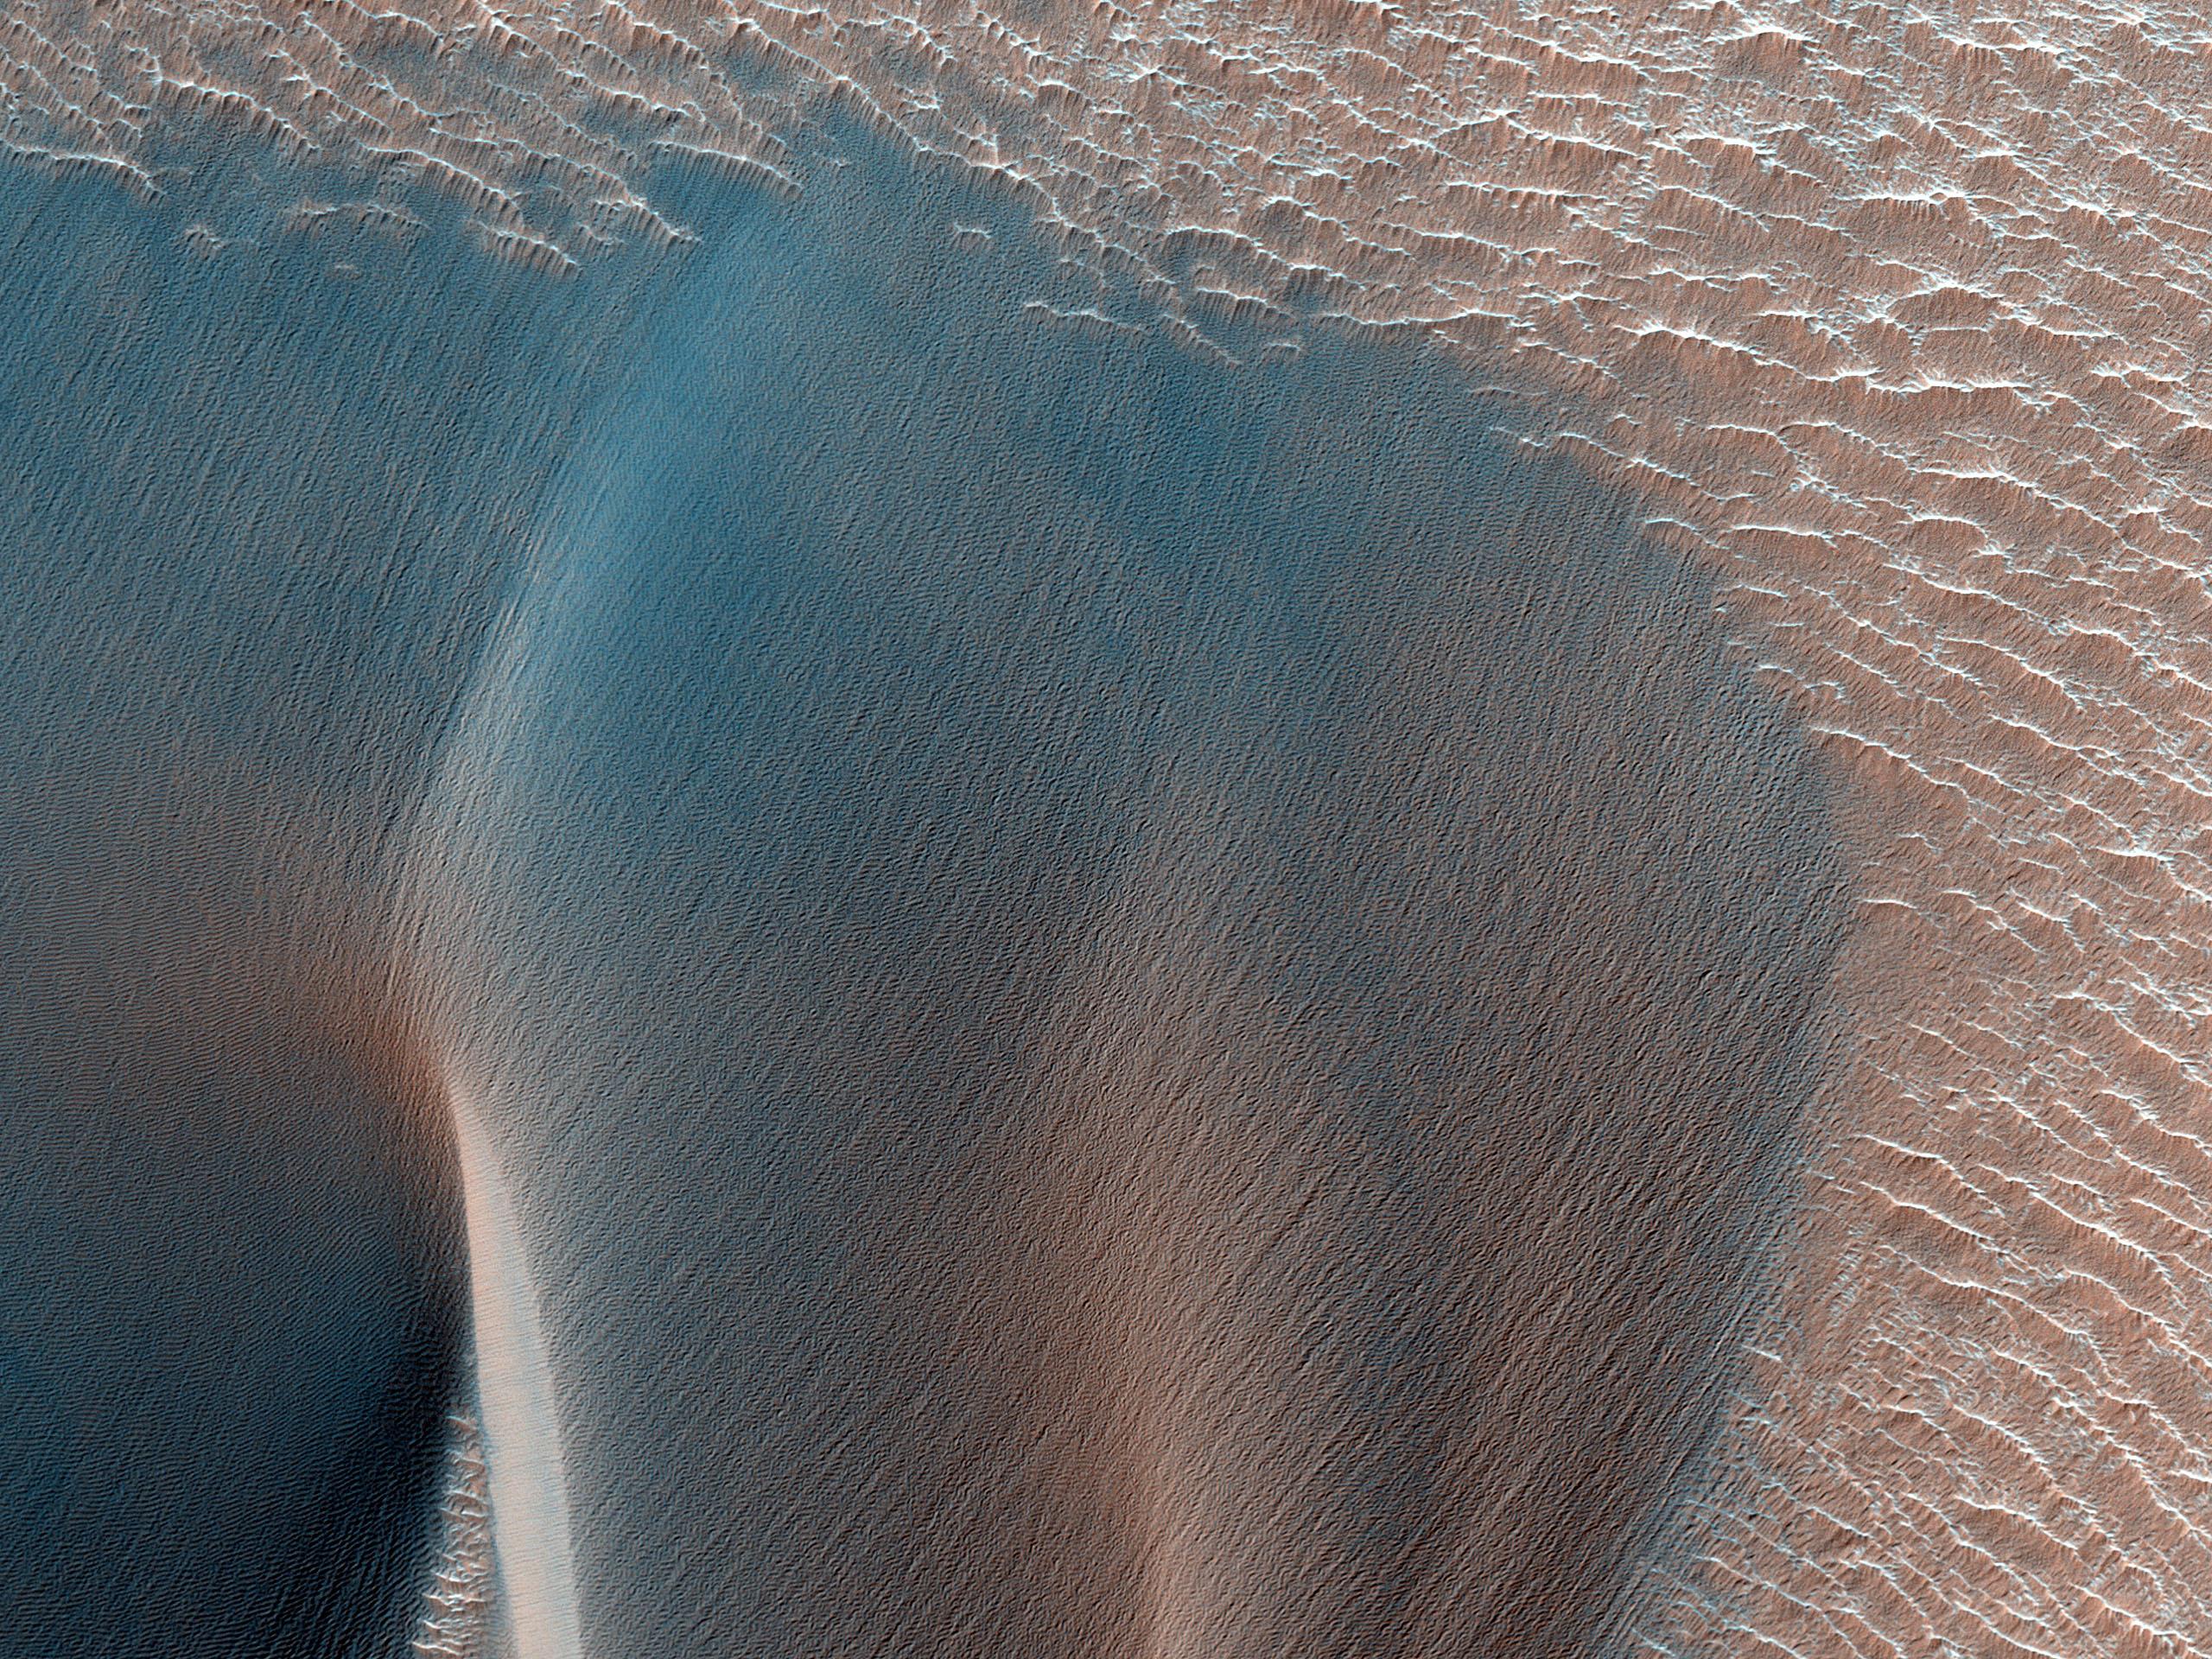 Northwest Ius Chasma Landslide and Dune Field